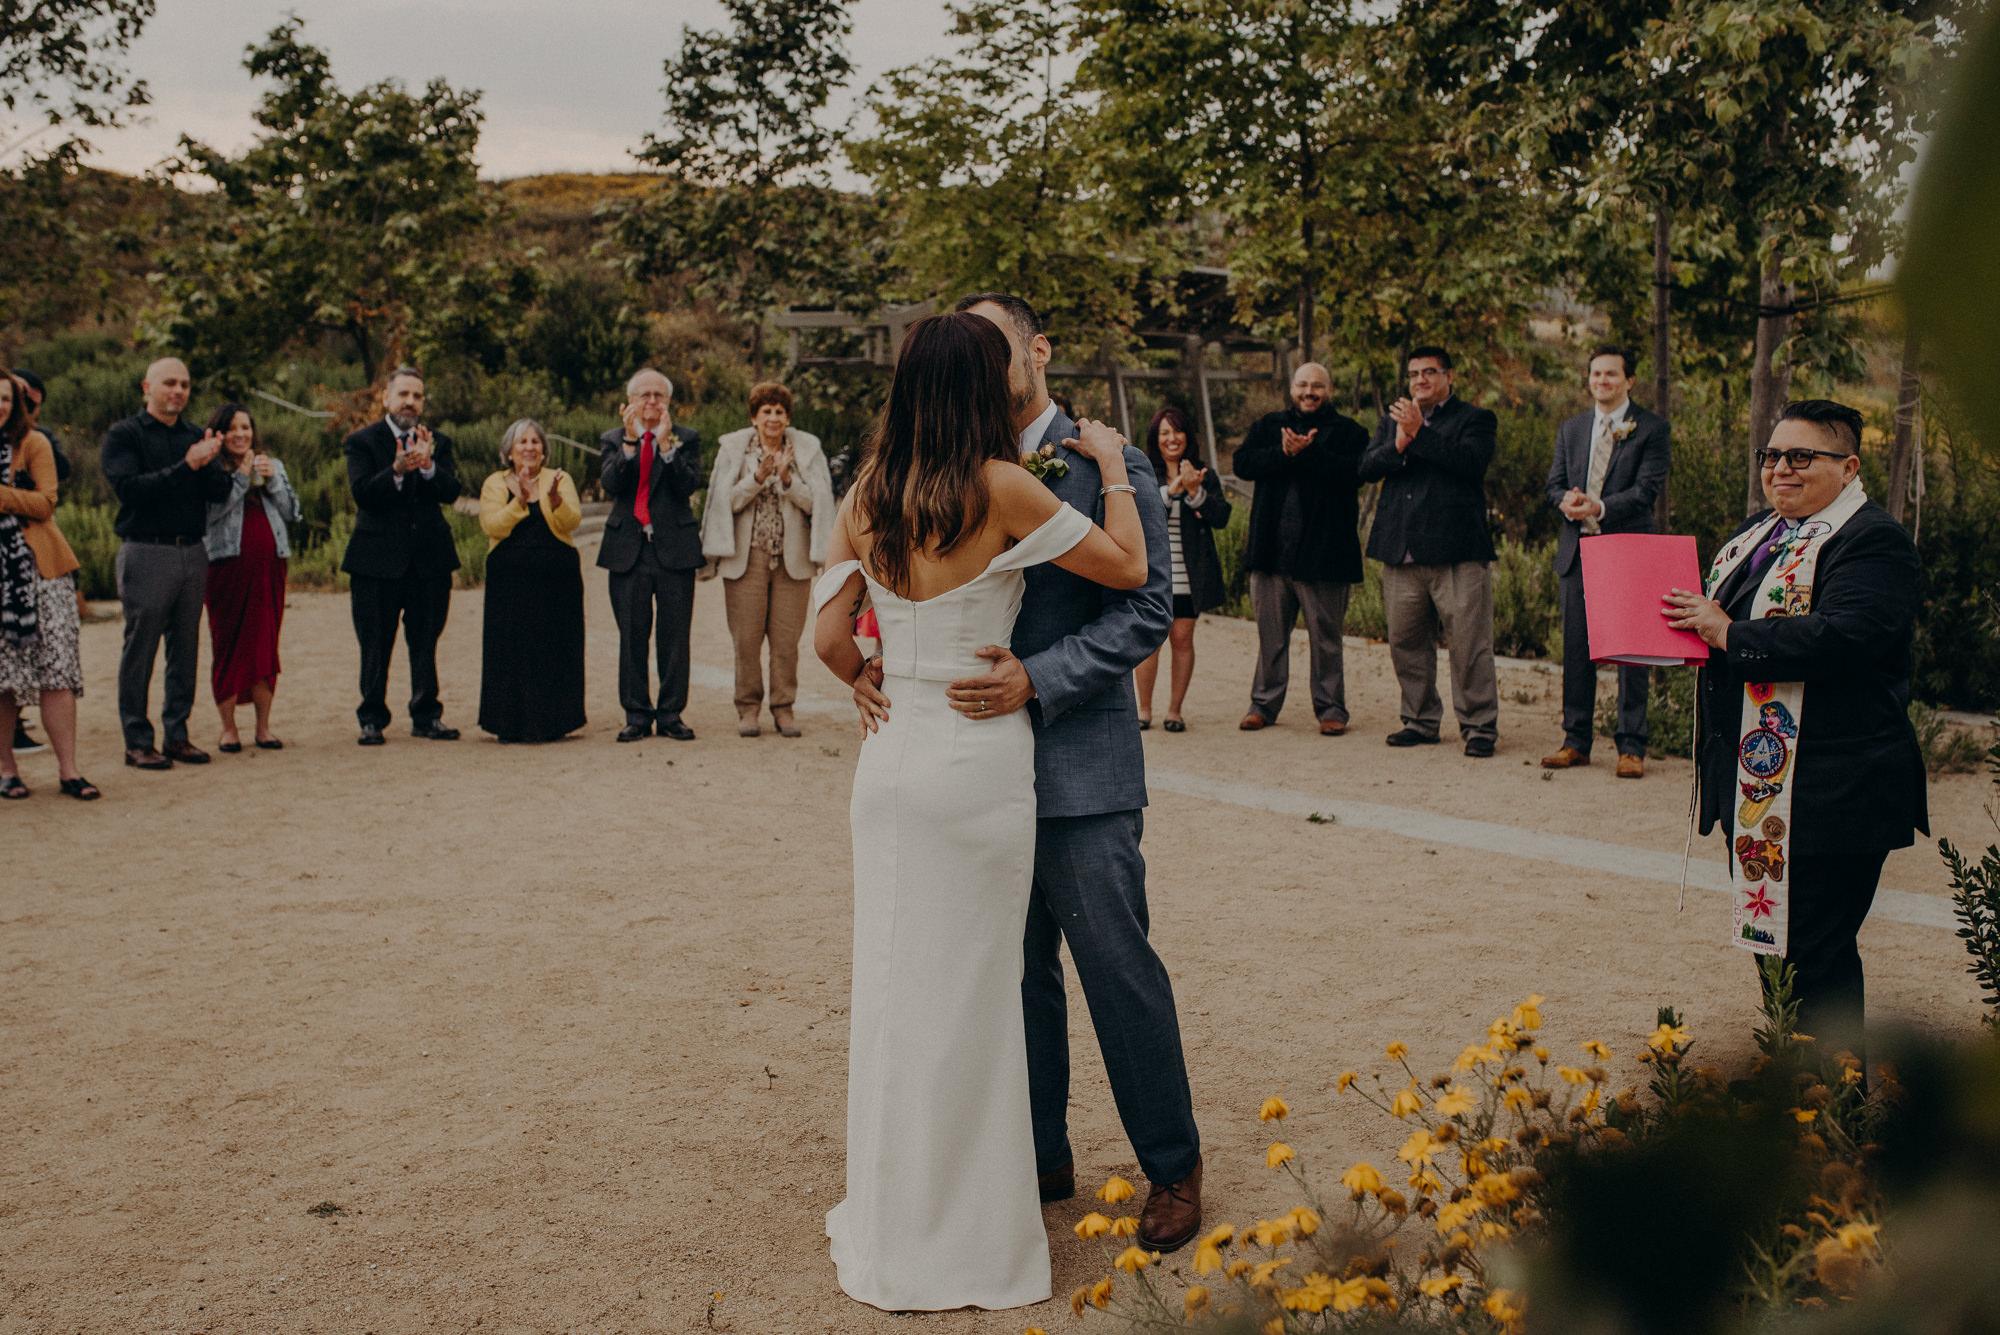 elopement photographer in los angeles - la wedding photographer - isaiahandtaylor.com-069.jpg